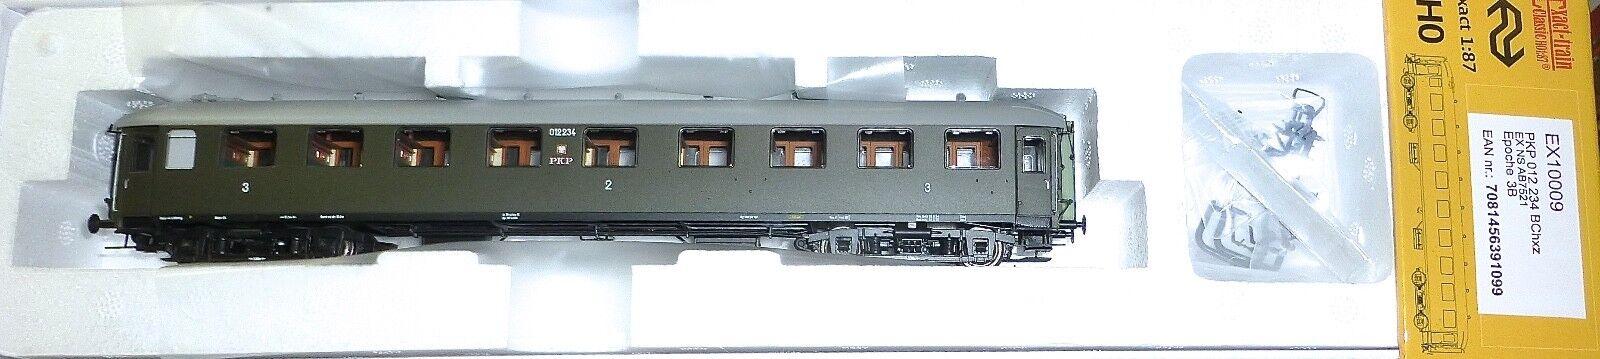 Exact-Train ex10009 PCP 012 234 bchxz EX NS ab7521 epiiib h0 1 87 OVP kc2 µ